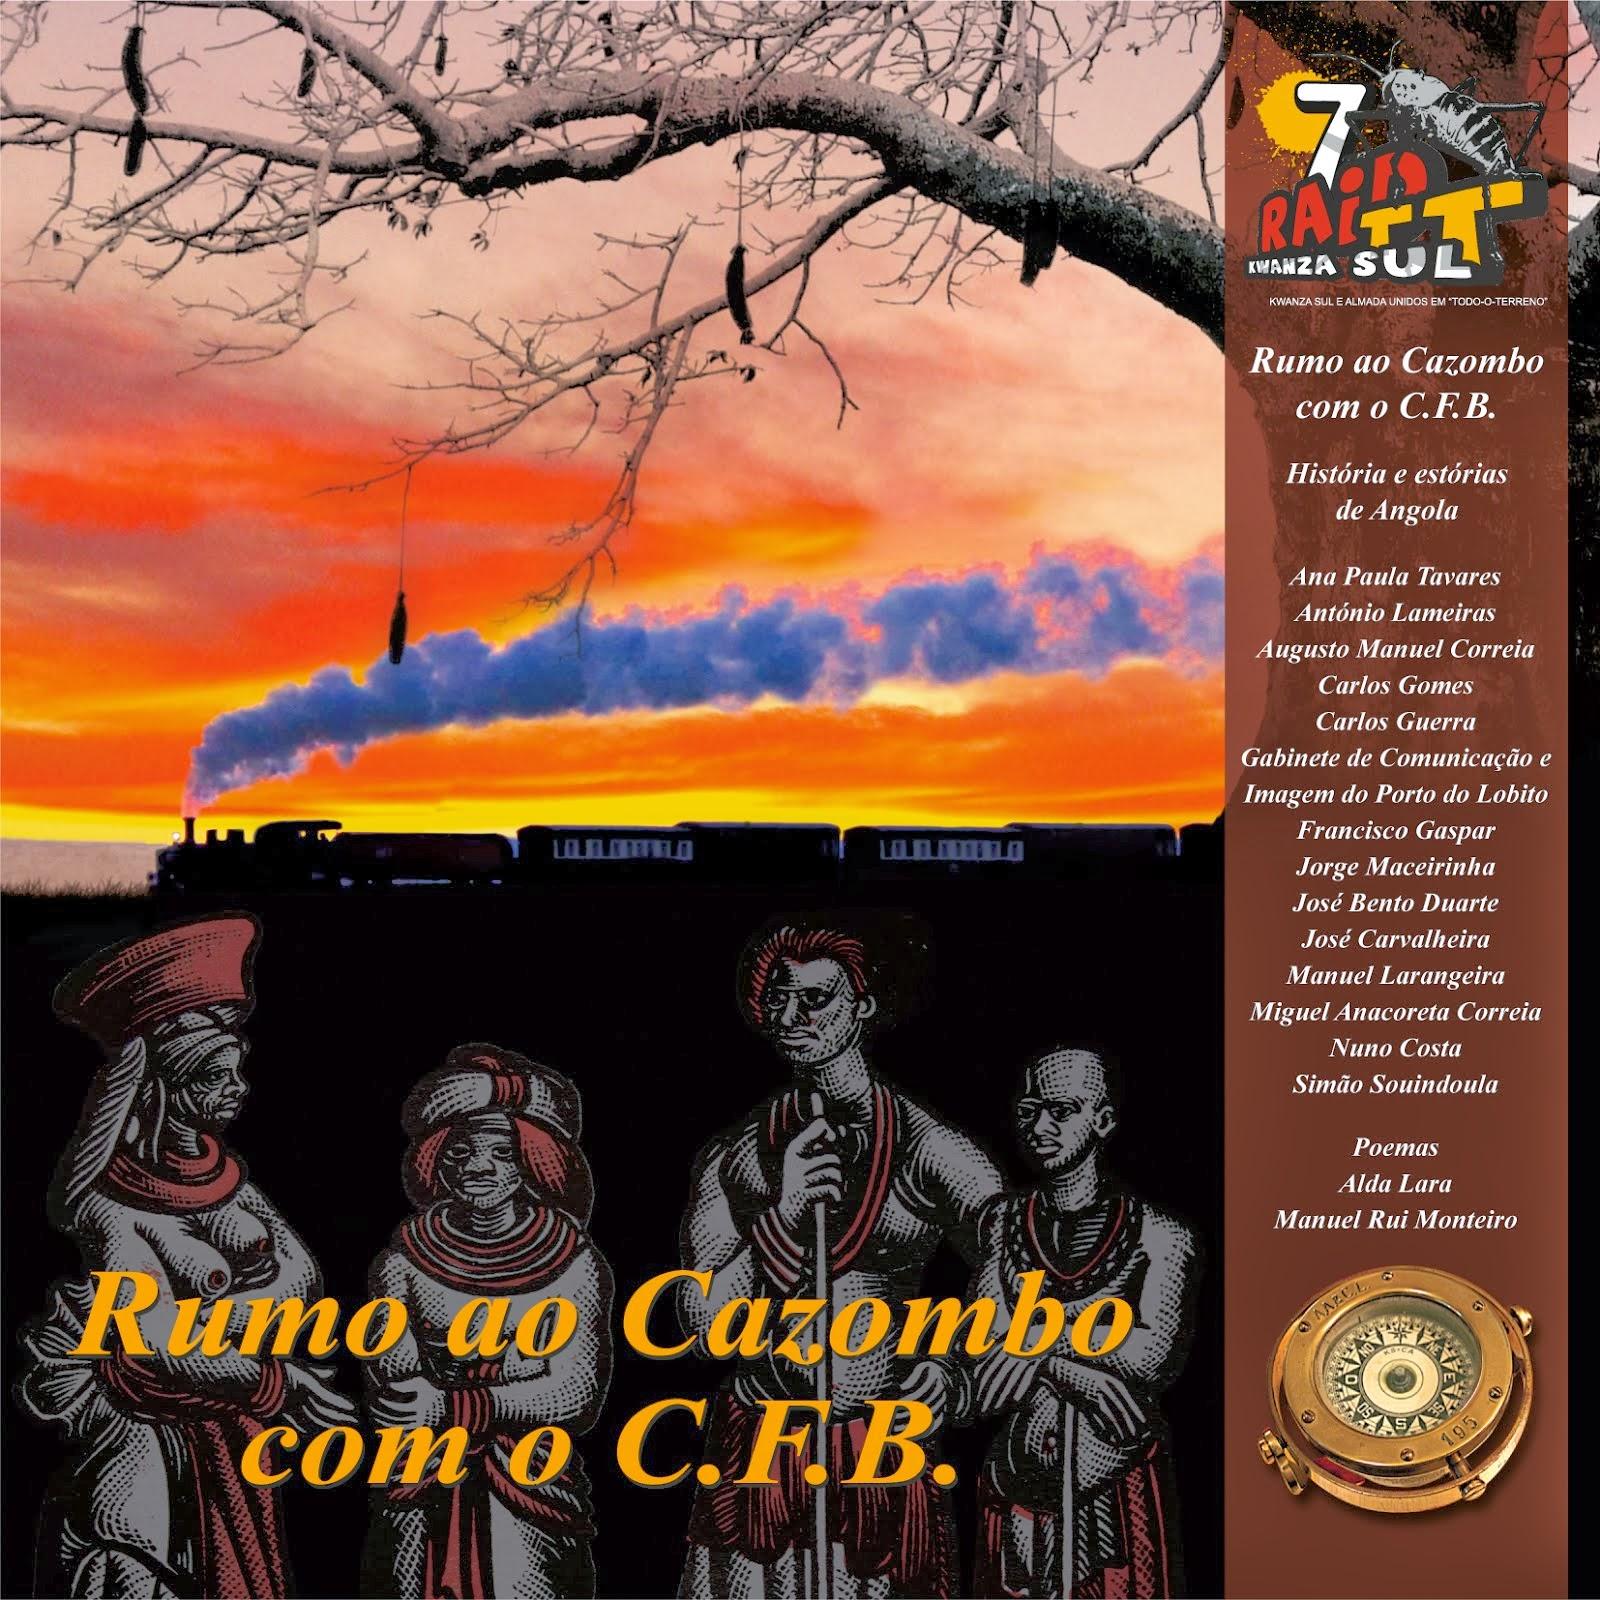 Livro do 7º Raid TT Kwanza Sul